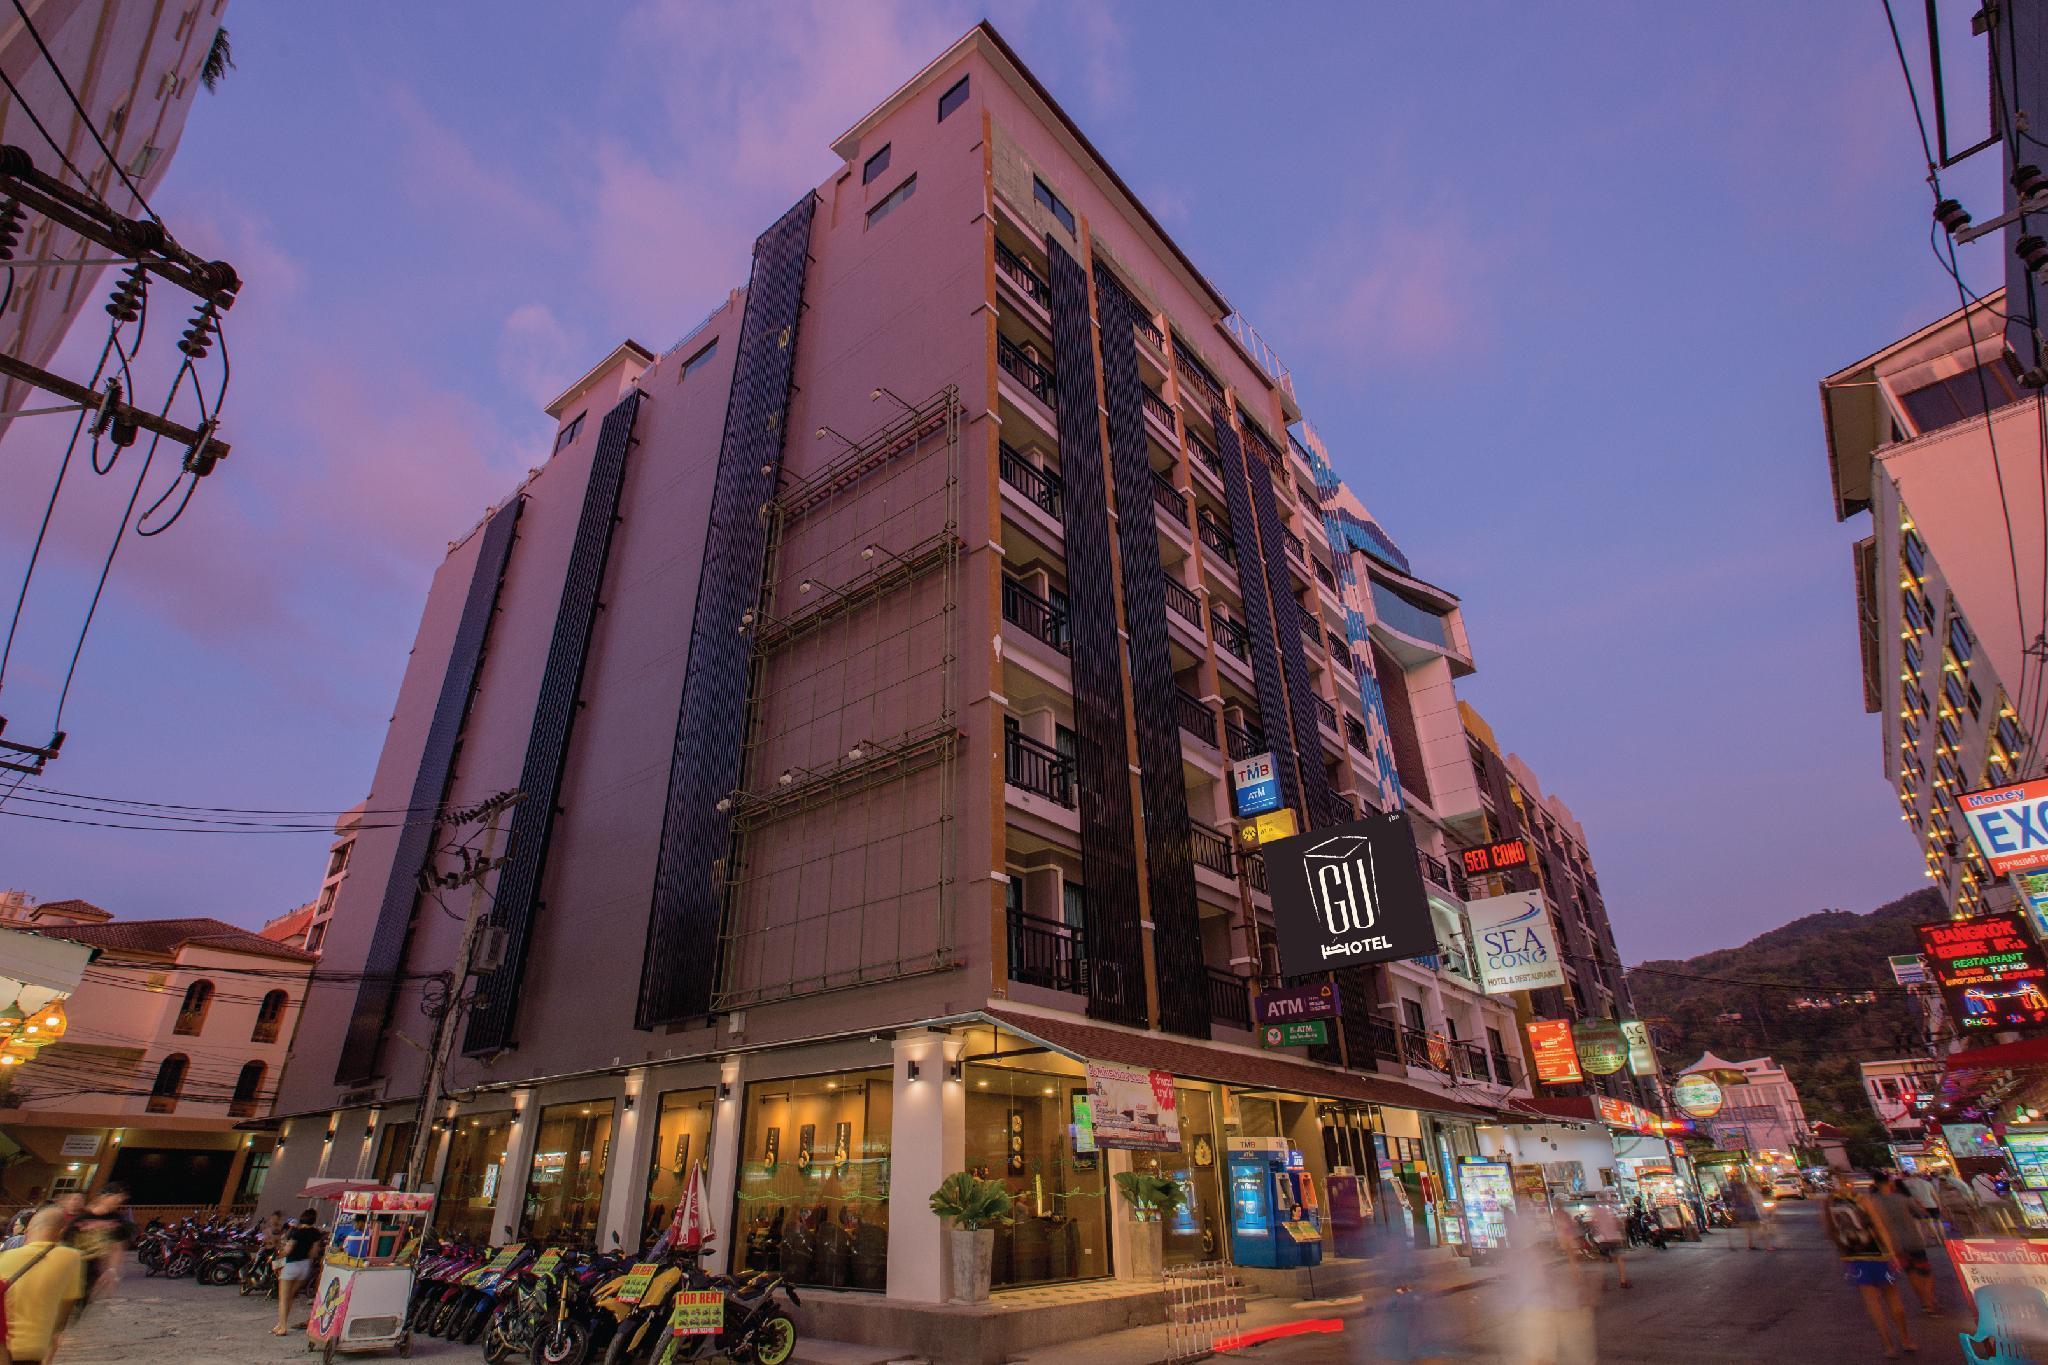 Gu Hotel @ Sansabai โรงแรมกู